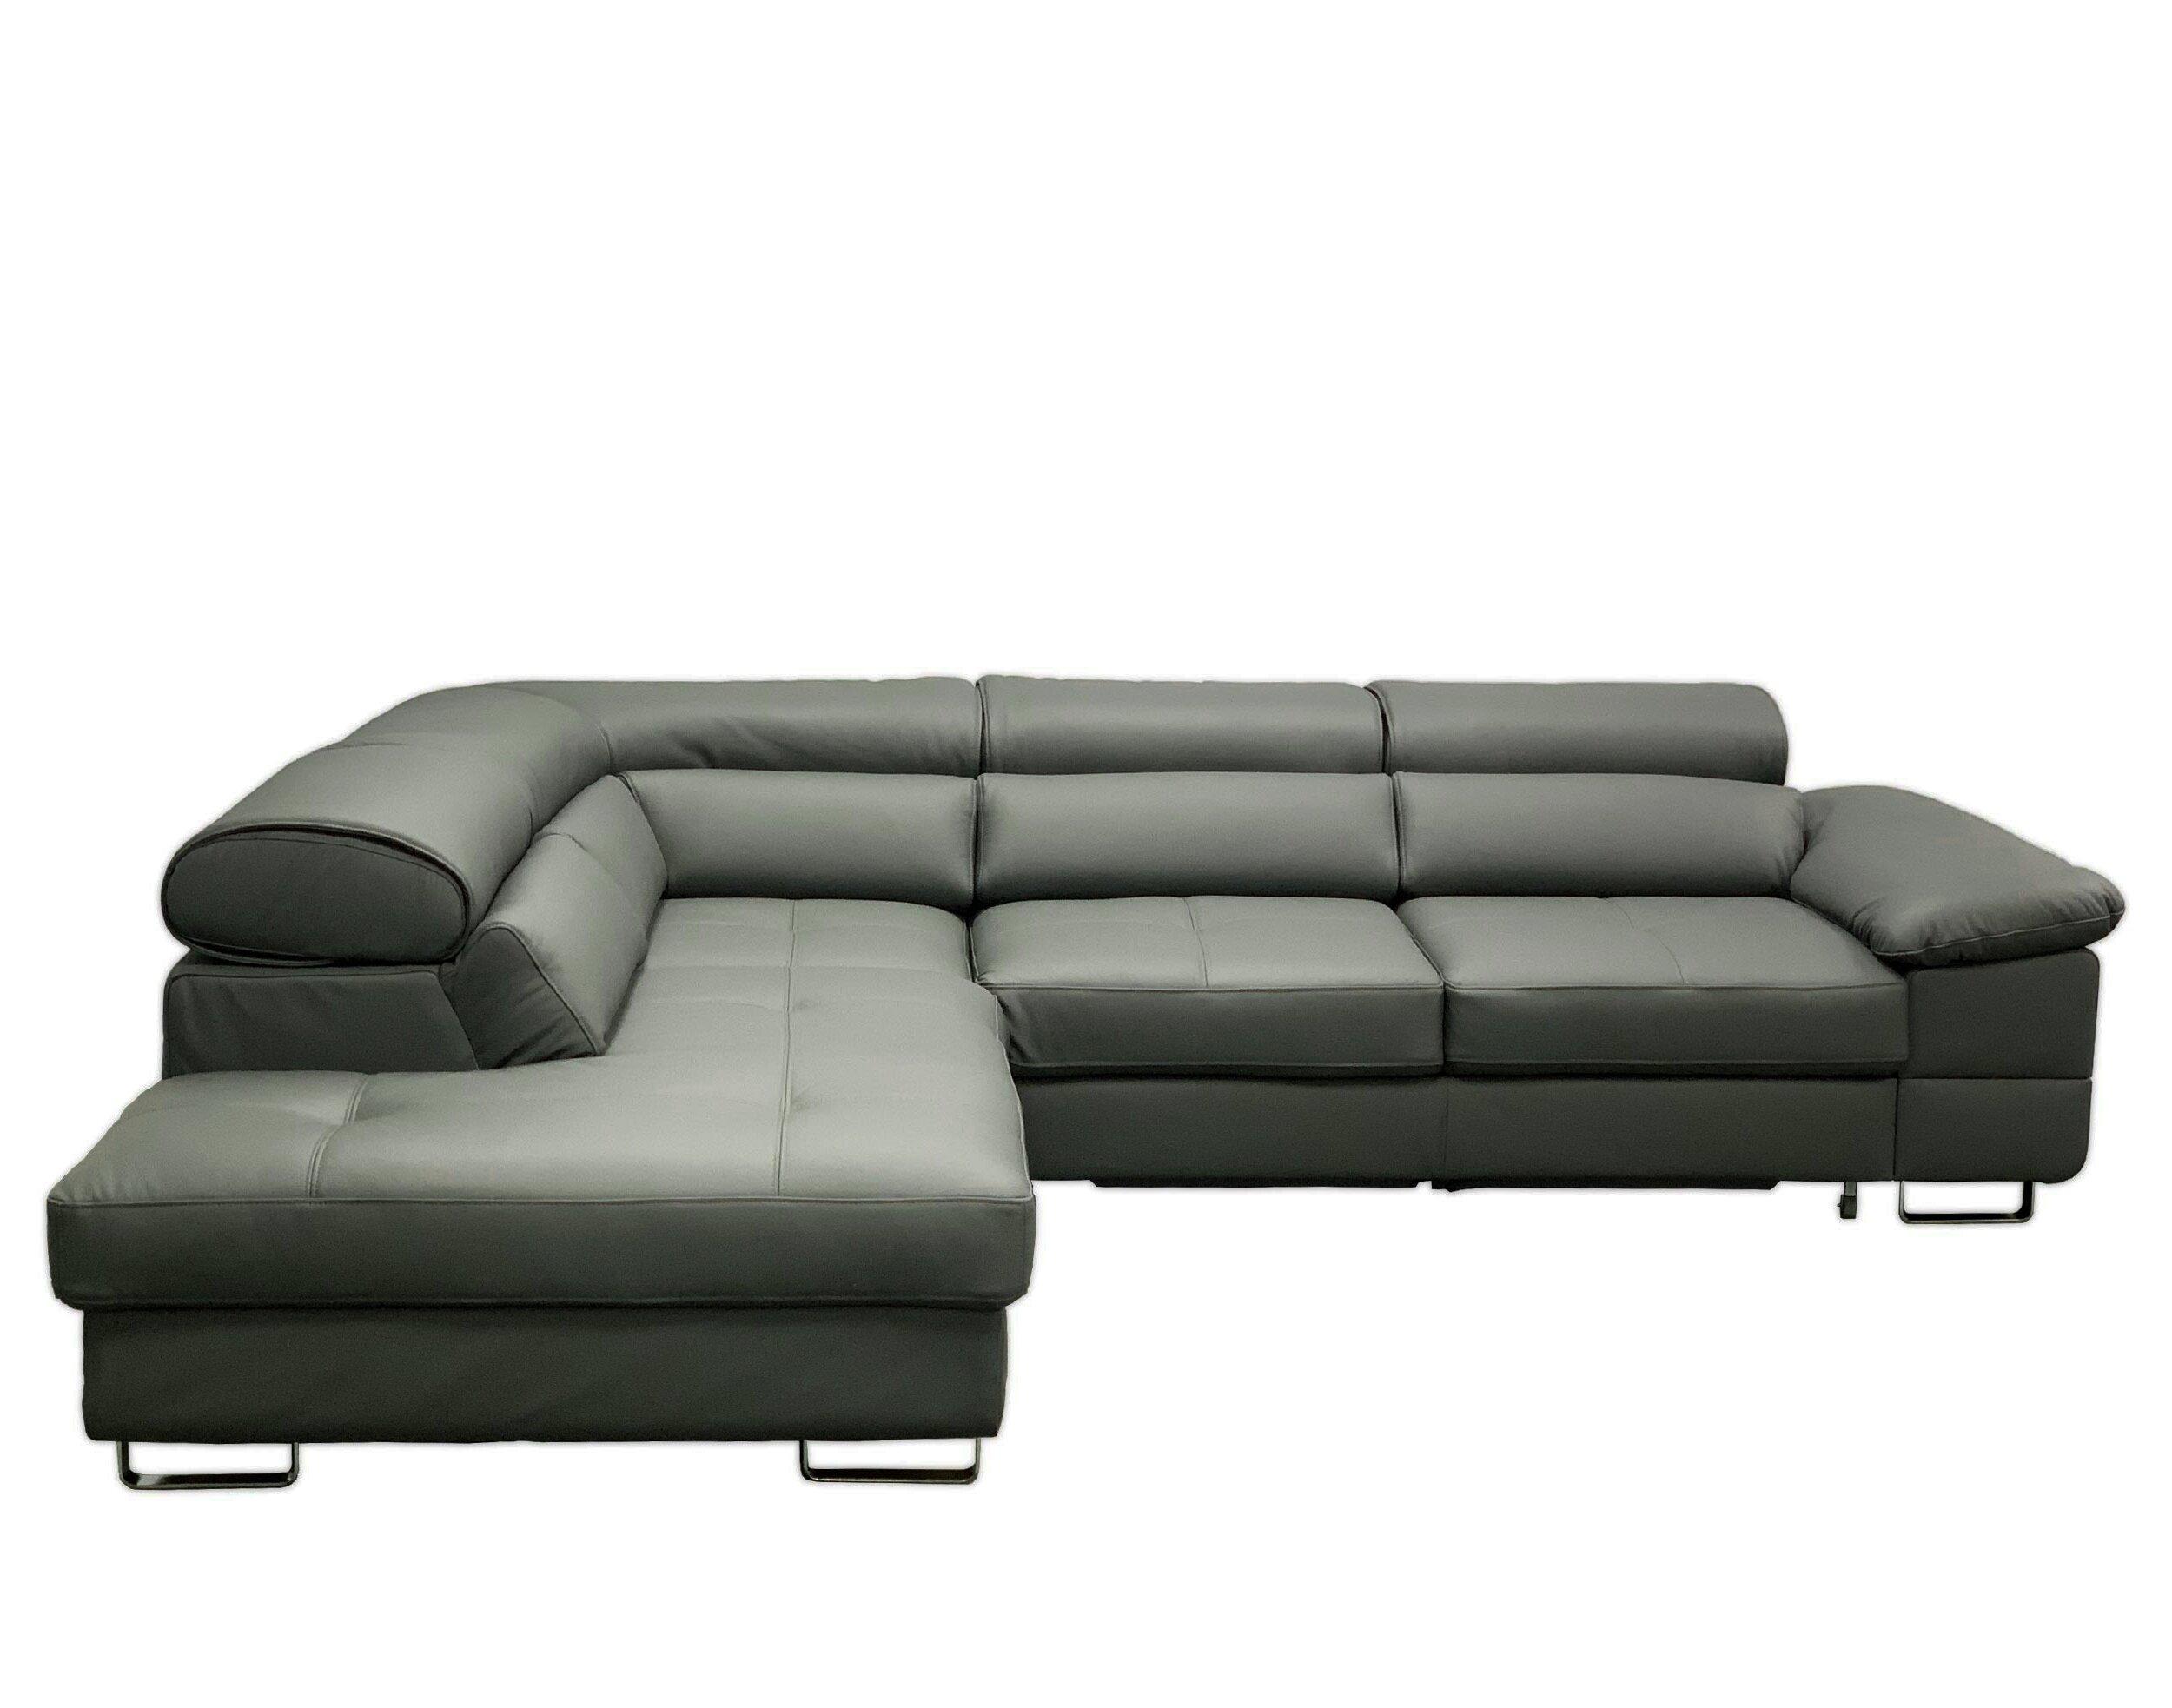 Picture of: Orren Ellis Teillon 112 Genuine Leather Sleeper Sofa Chaise Wayfair